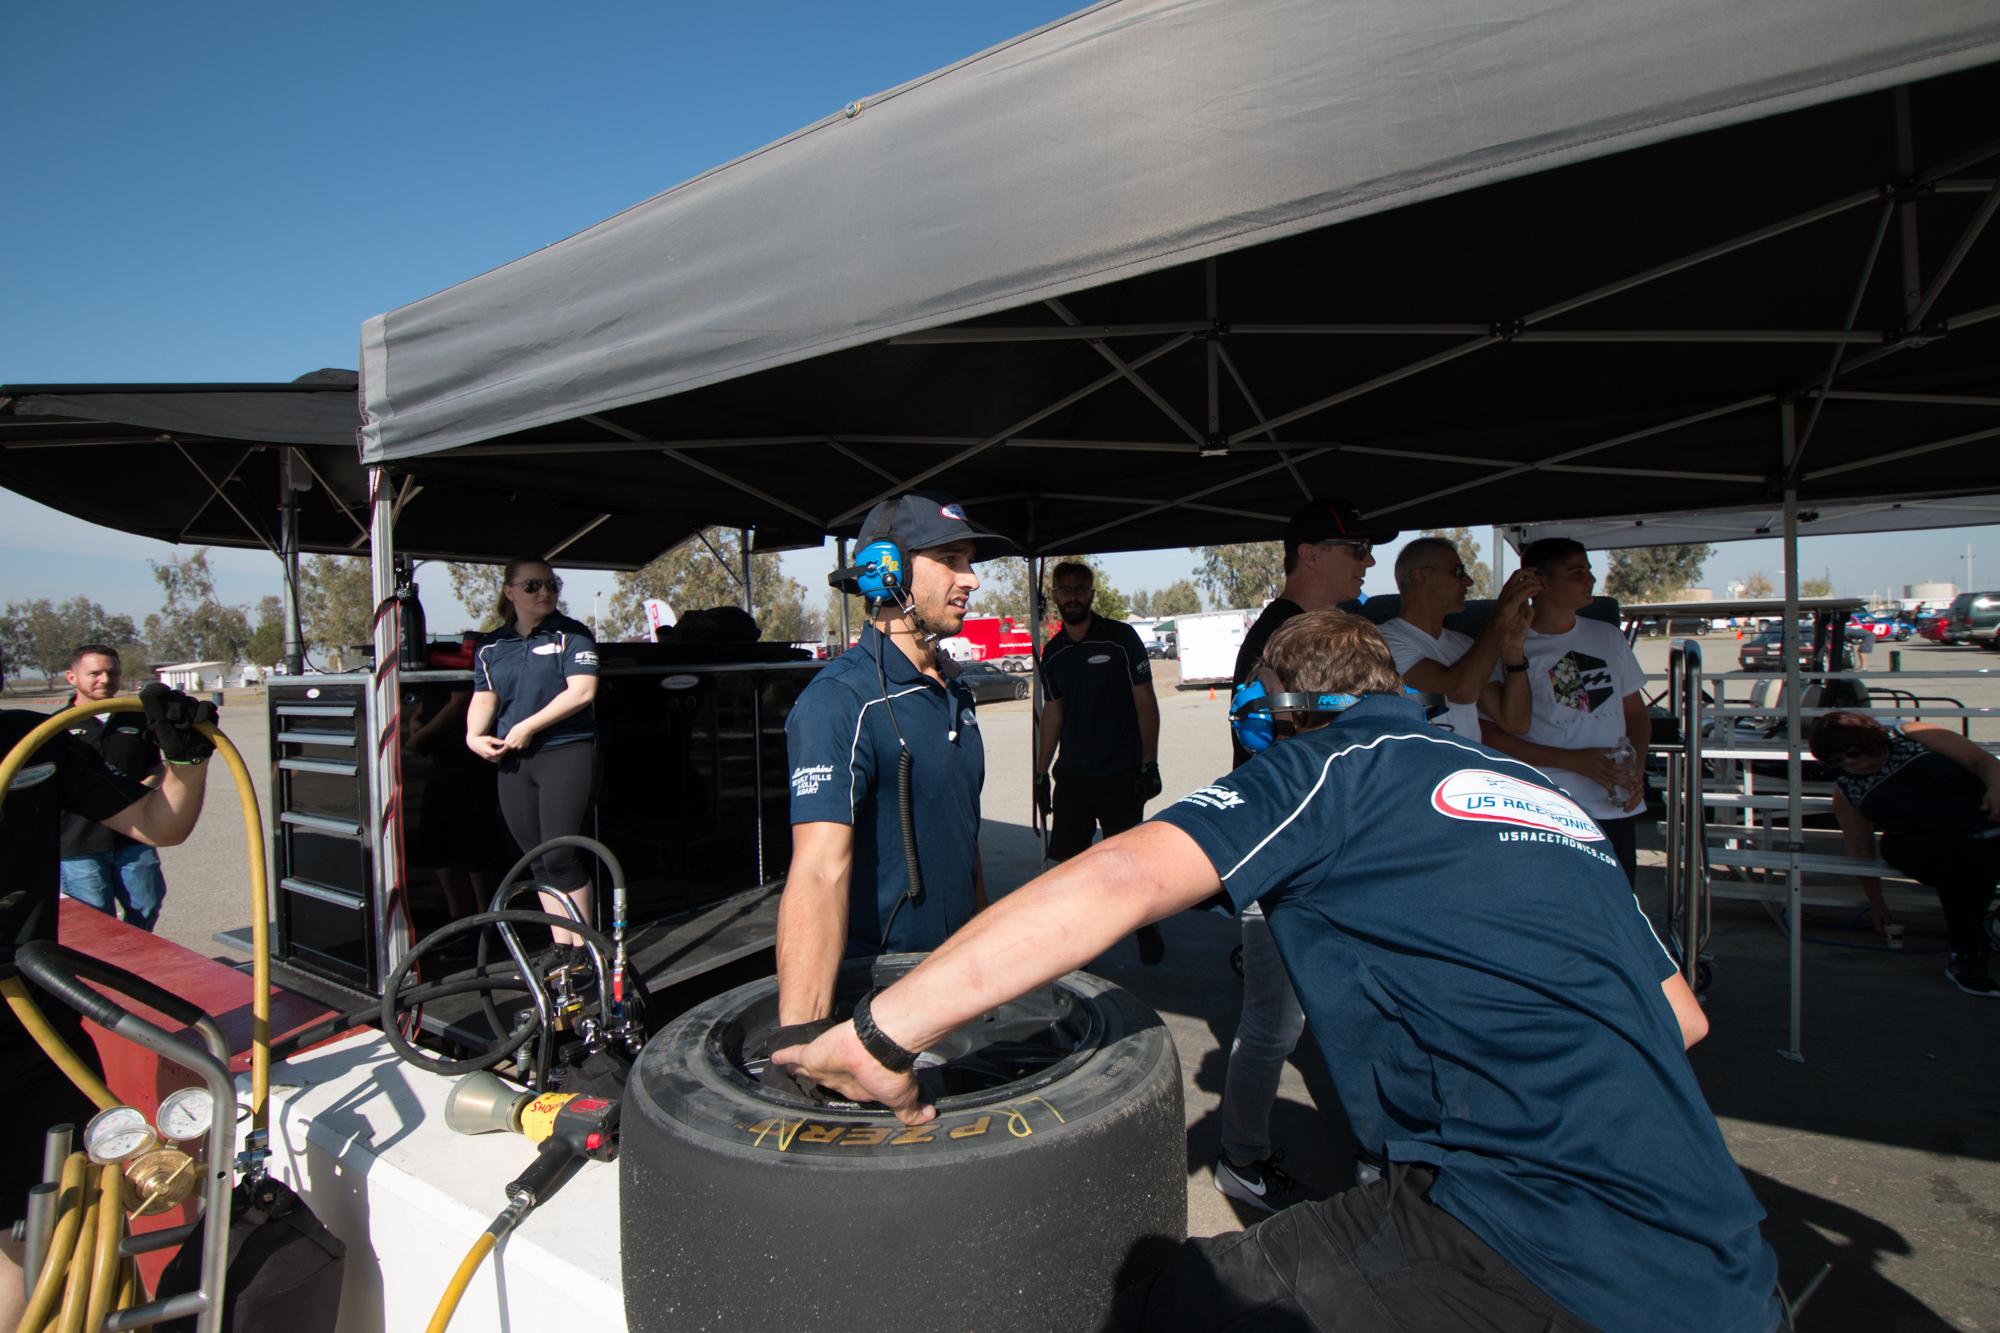 Steven-Racing-20130228-55394.jpg